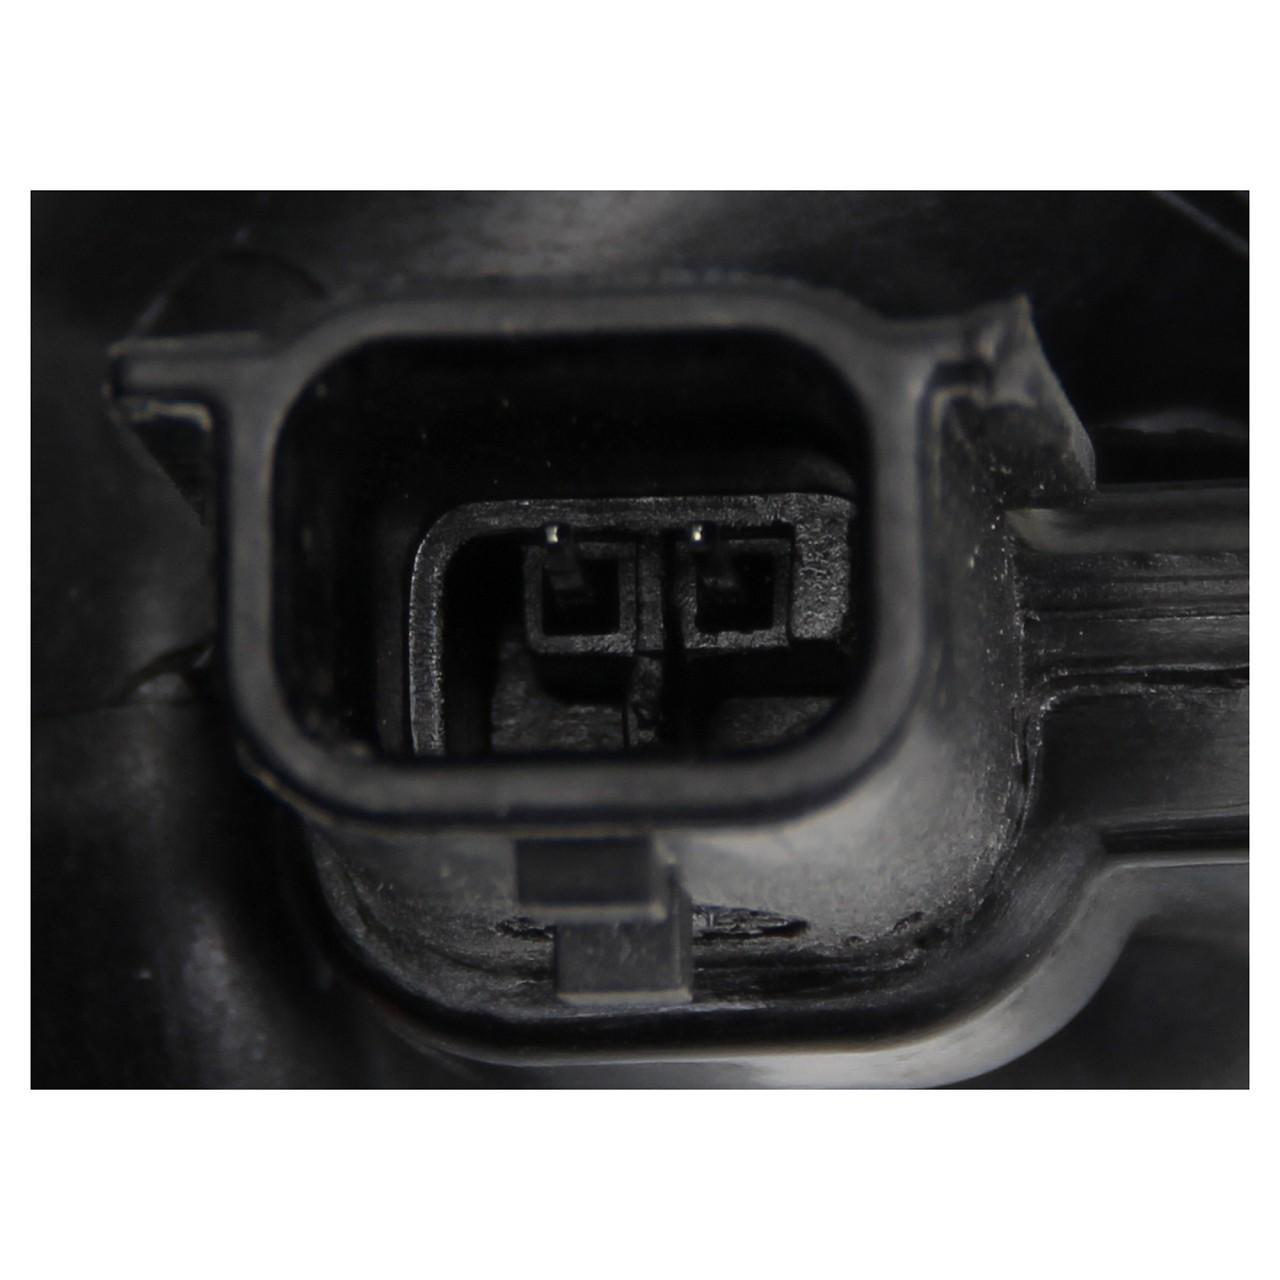 ORIGINAL Renault Thermostat + Gehäuse CAPTUR CLIO IV 0.9 TCe 90 PS 110612563R